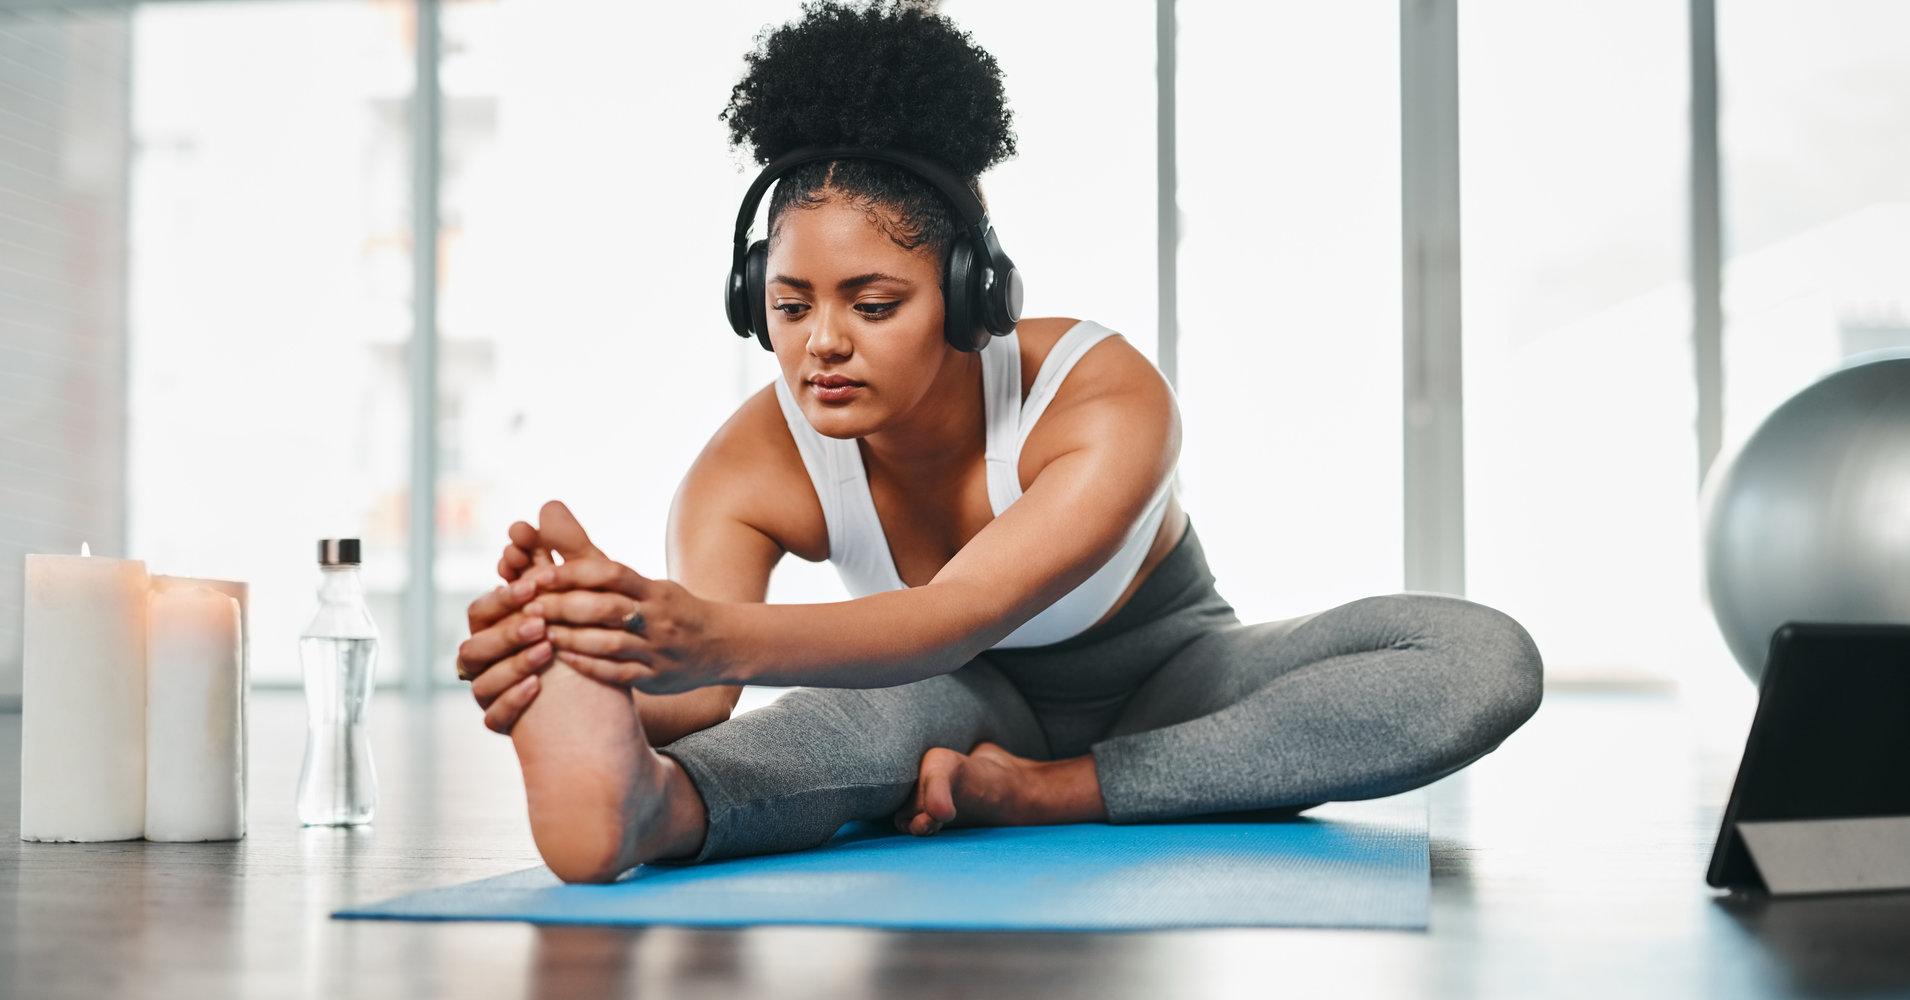 7 Dope Black, Female Fitness Gurus To Follow On YouTube - 21Ninety